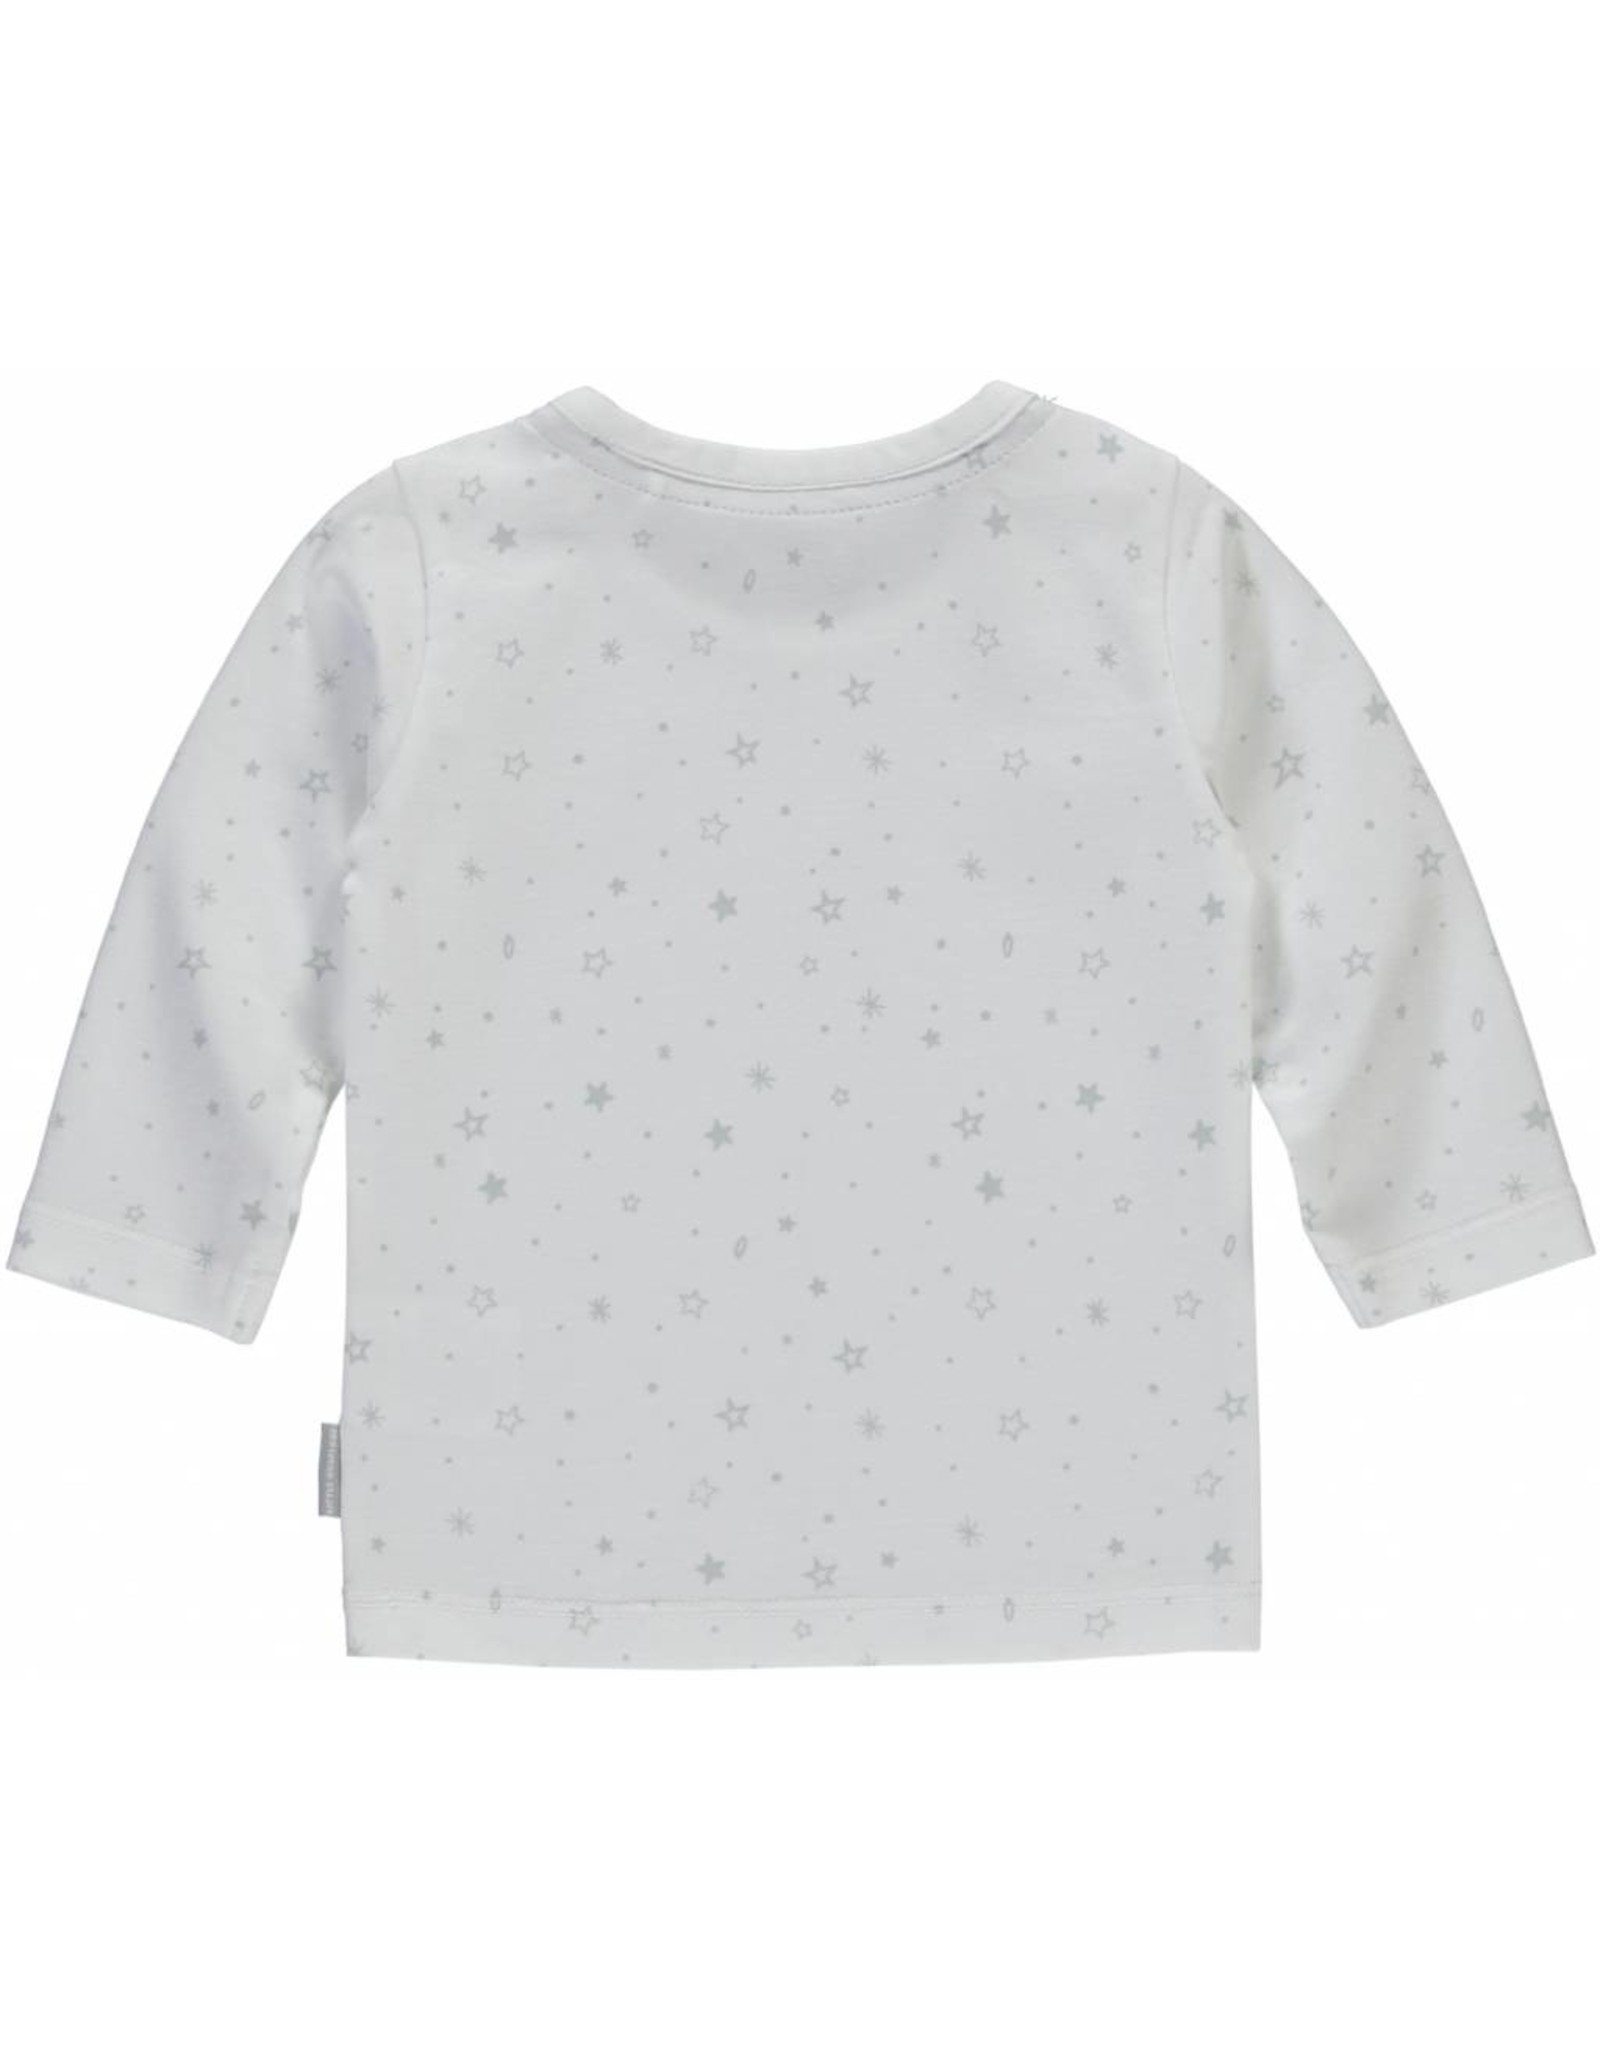 Quapi Quapi newborn unisex shirt ZADA